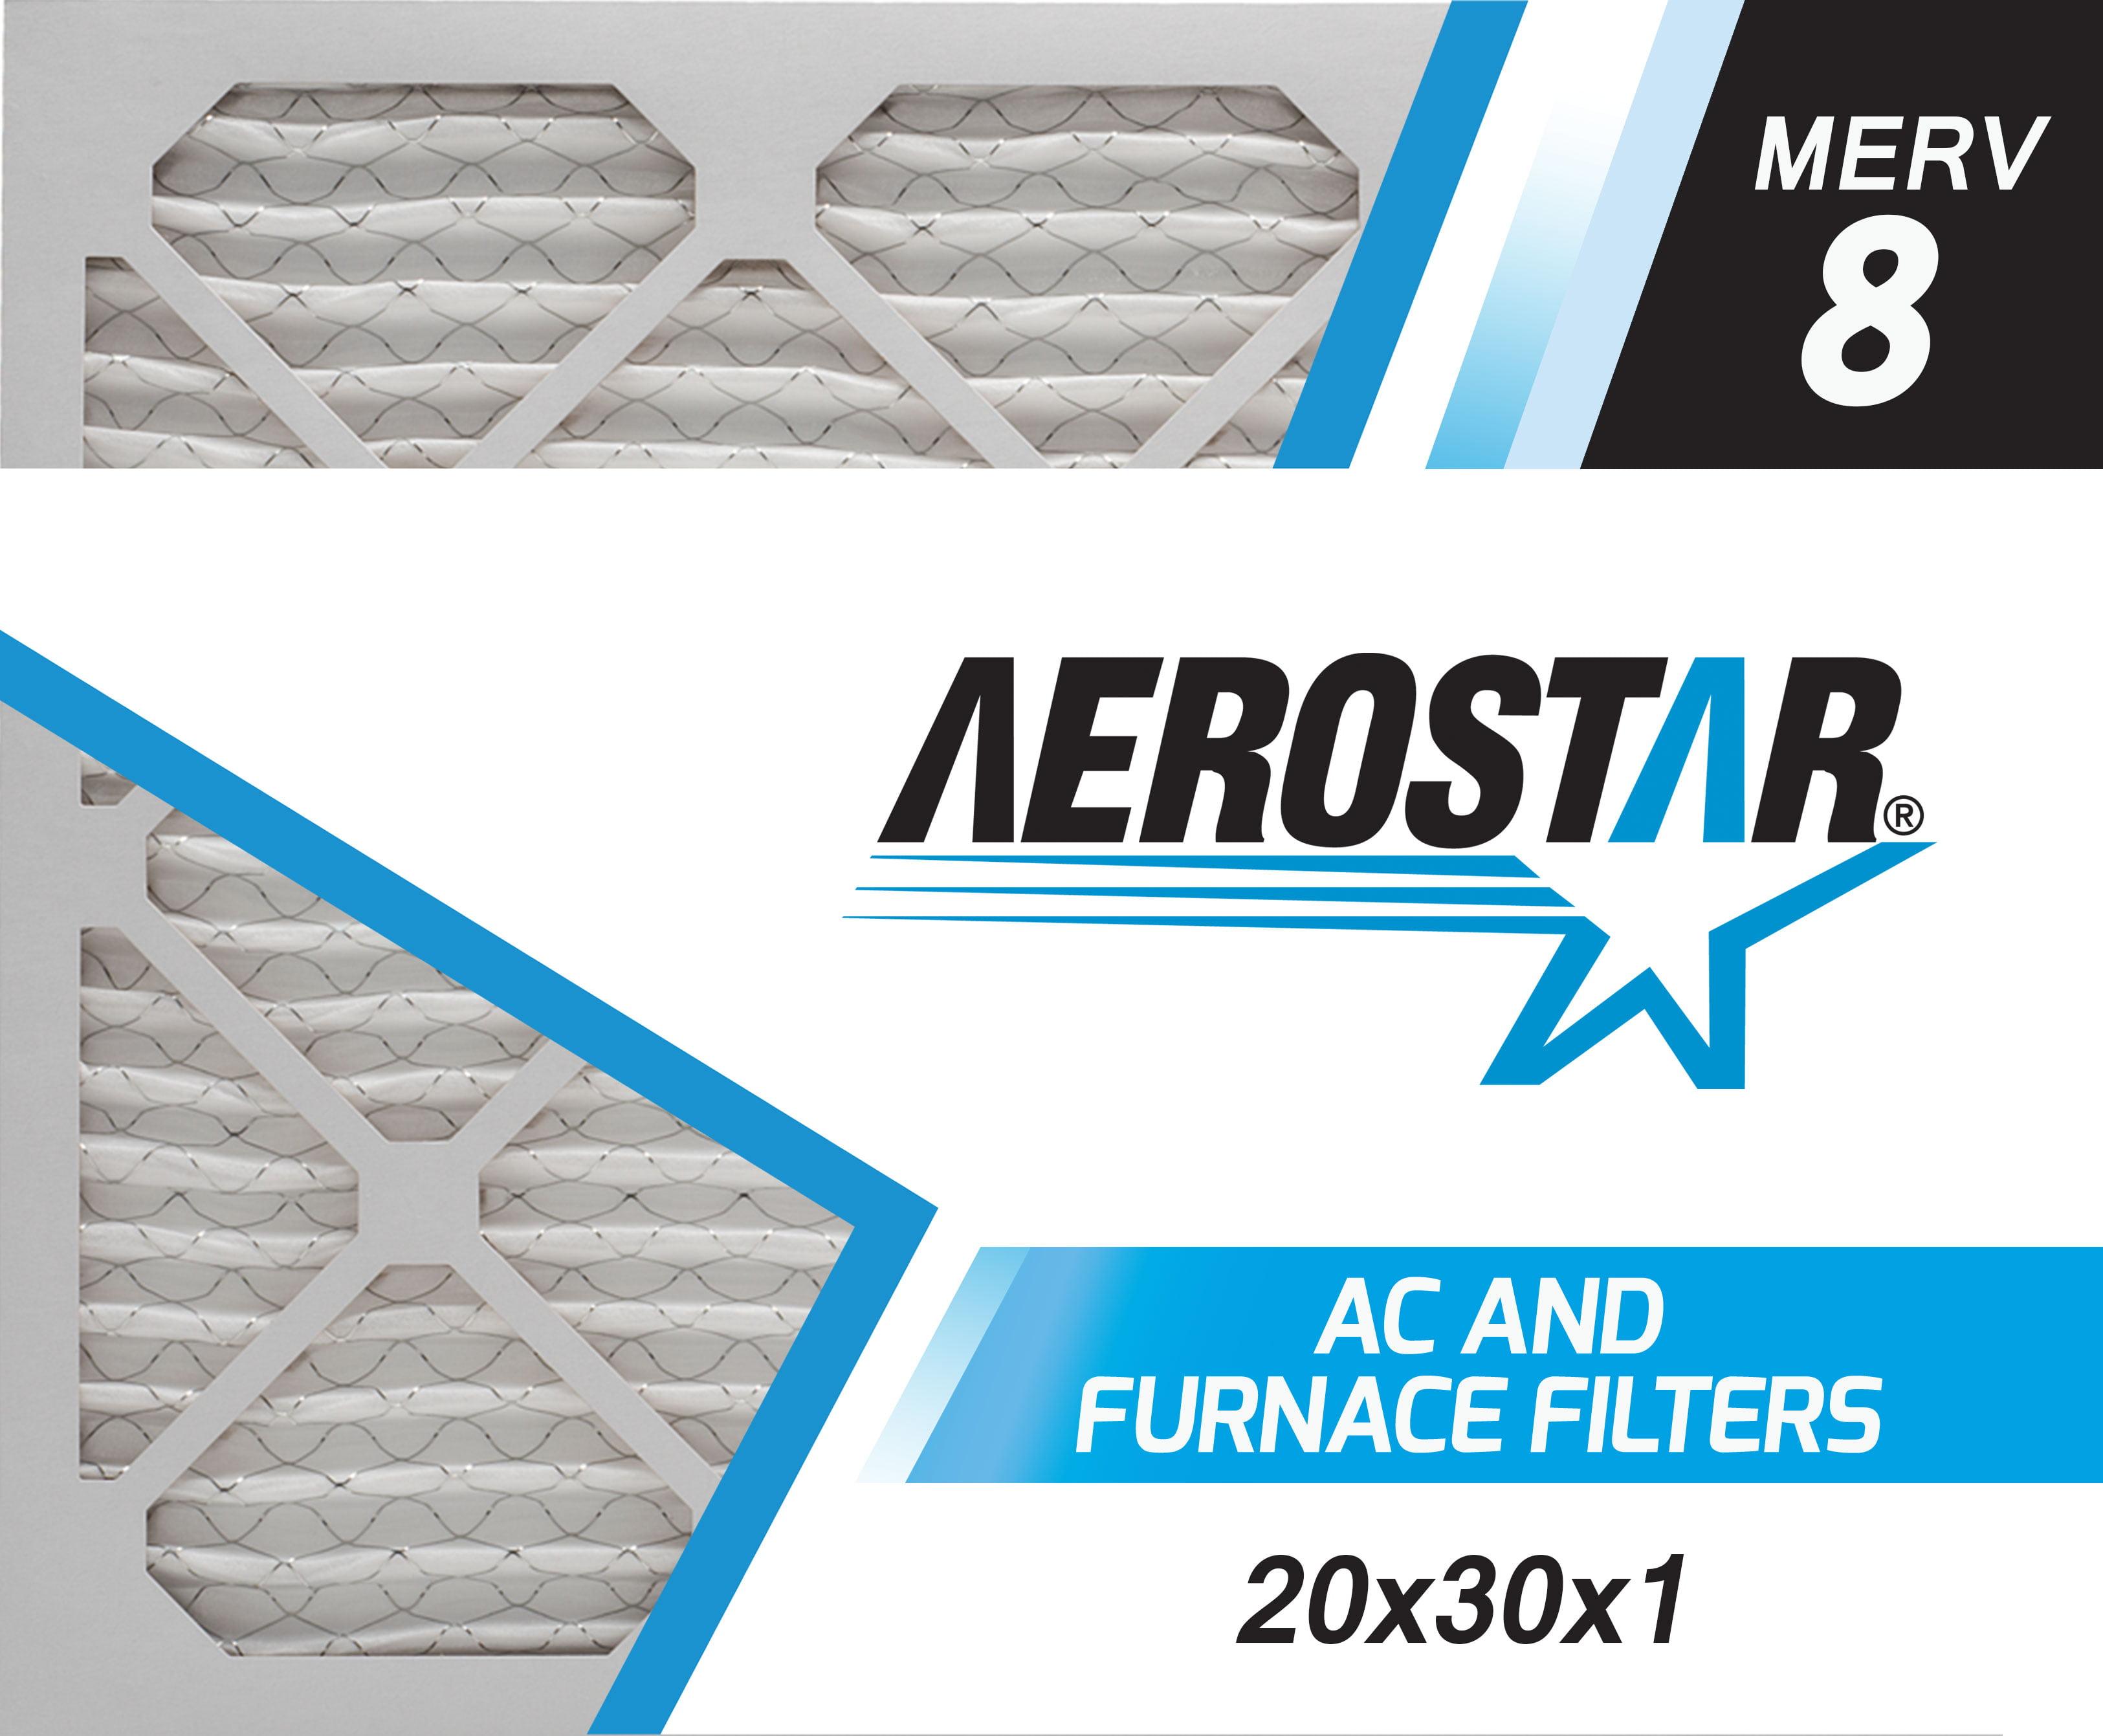 Washable Electrostatic 20x30x1 MERV 8 High Dust Holding Capacity 20x30x1 CARTER HVAC /& Furnace Filter